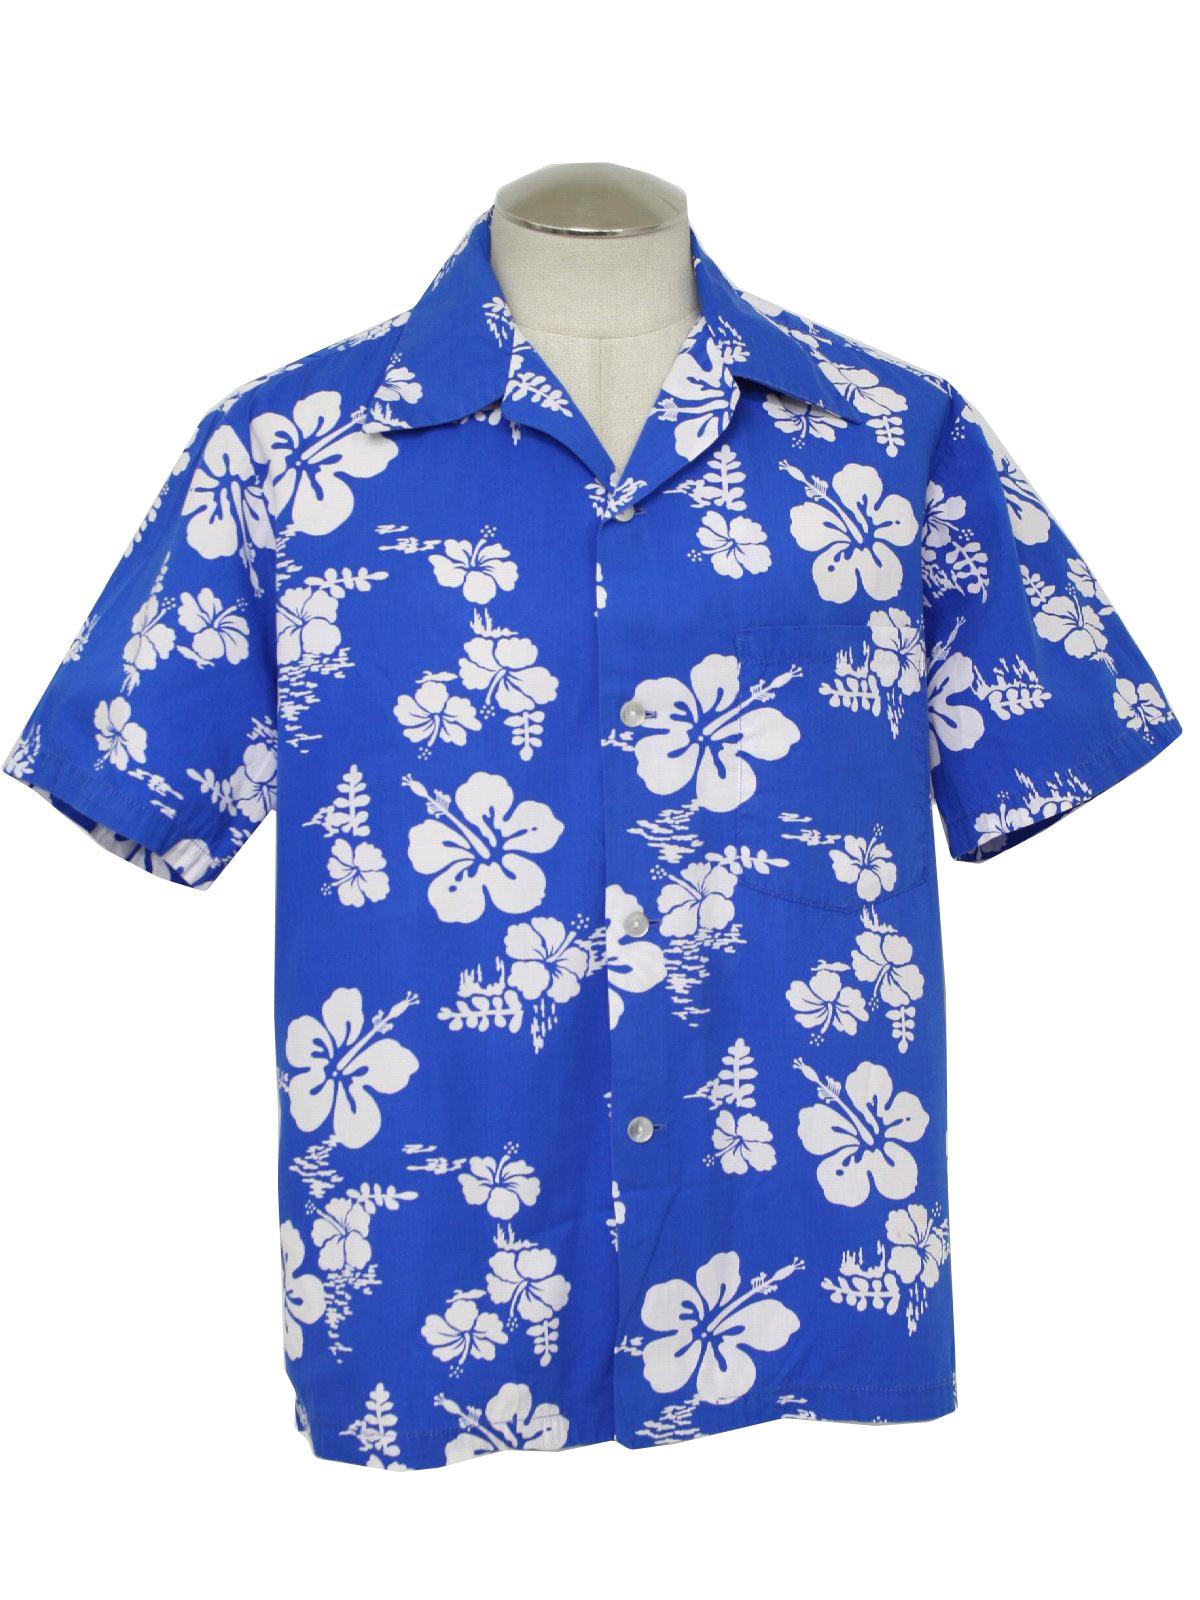 10dc23a7 Ui Maikai Sixties Vintage Hawaiian Shirt: 60s -Ui Maikai- Mens blue ...